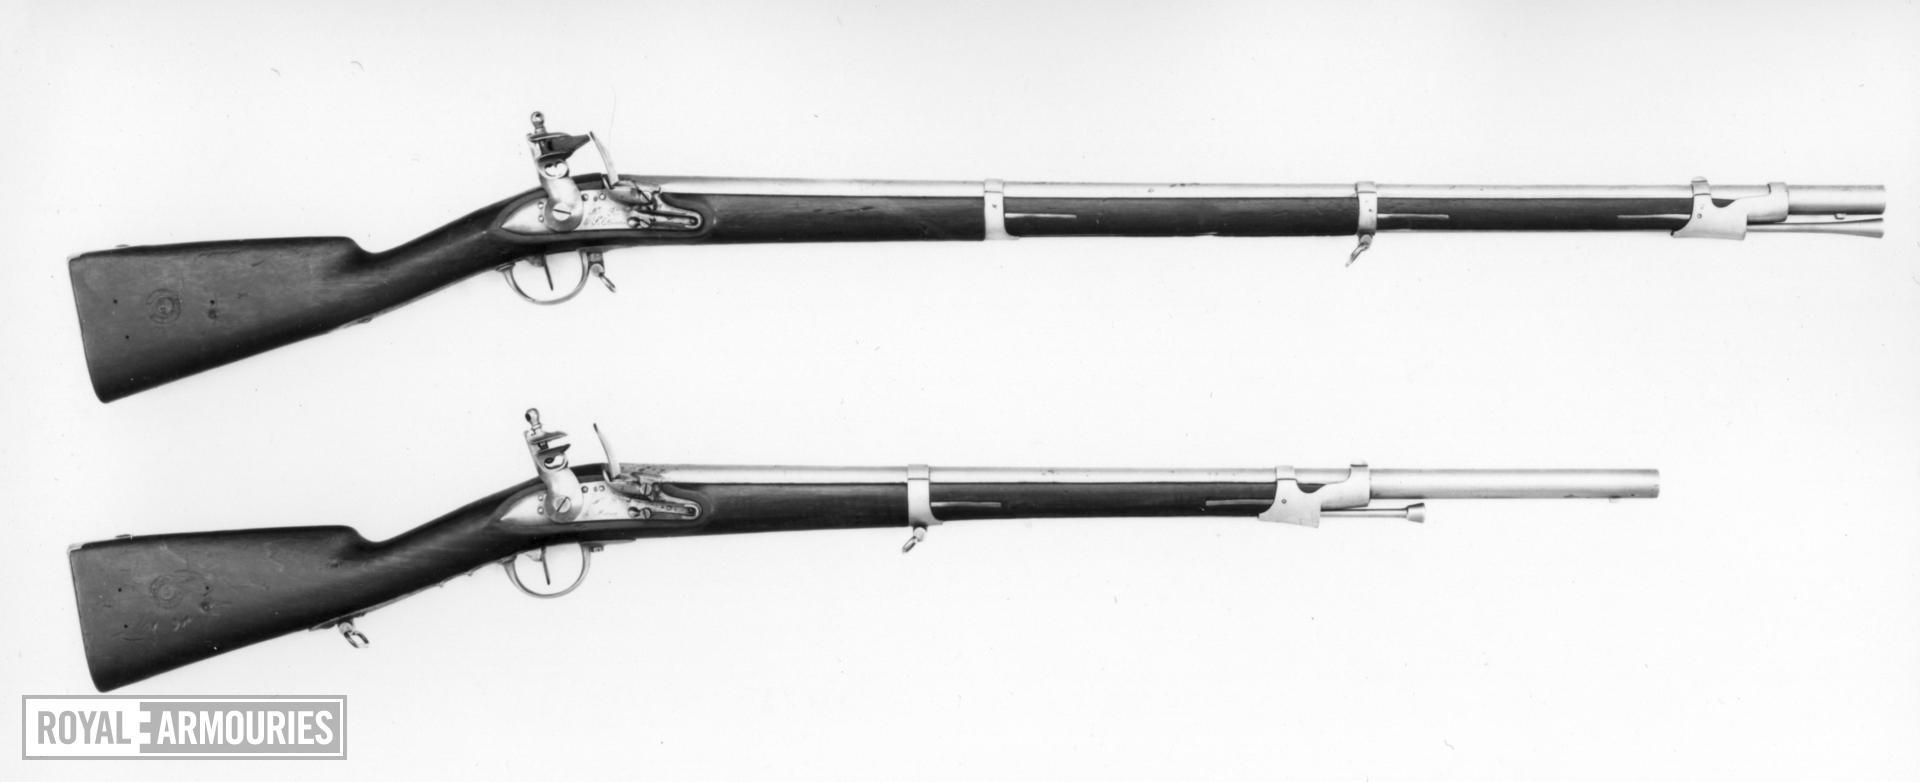 Flintlock muzzle-loading military musket - Model 1822 Dragoon